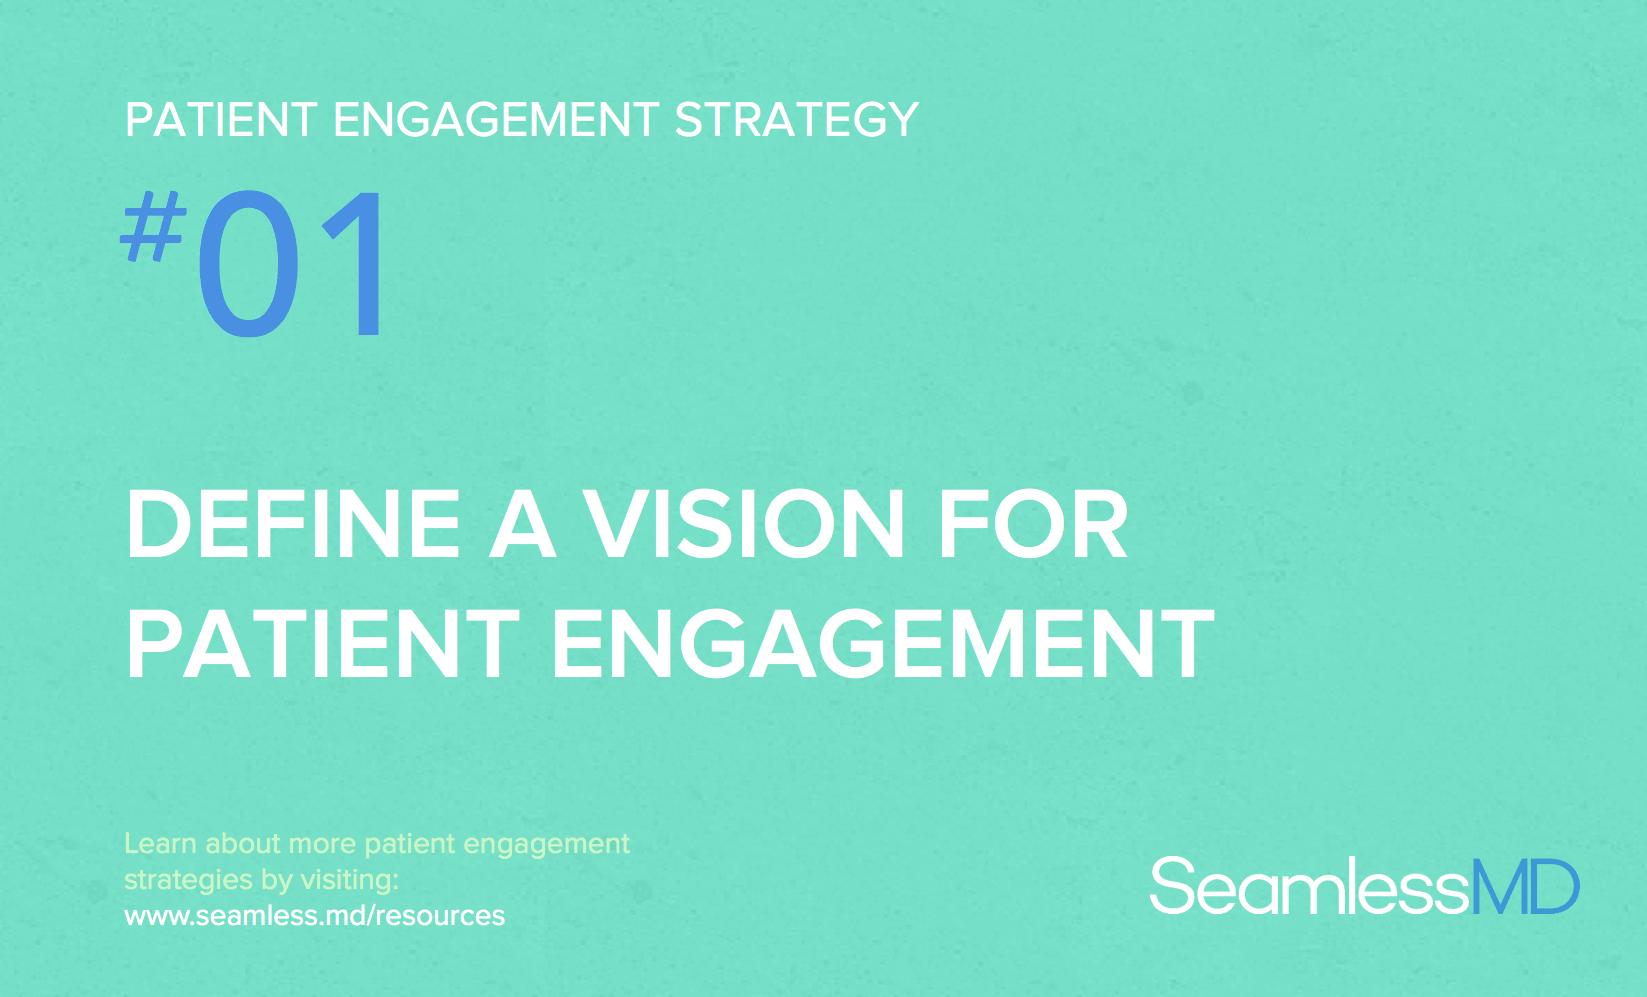 vision for patient engagement